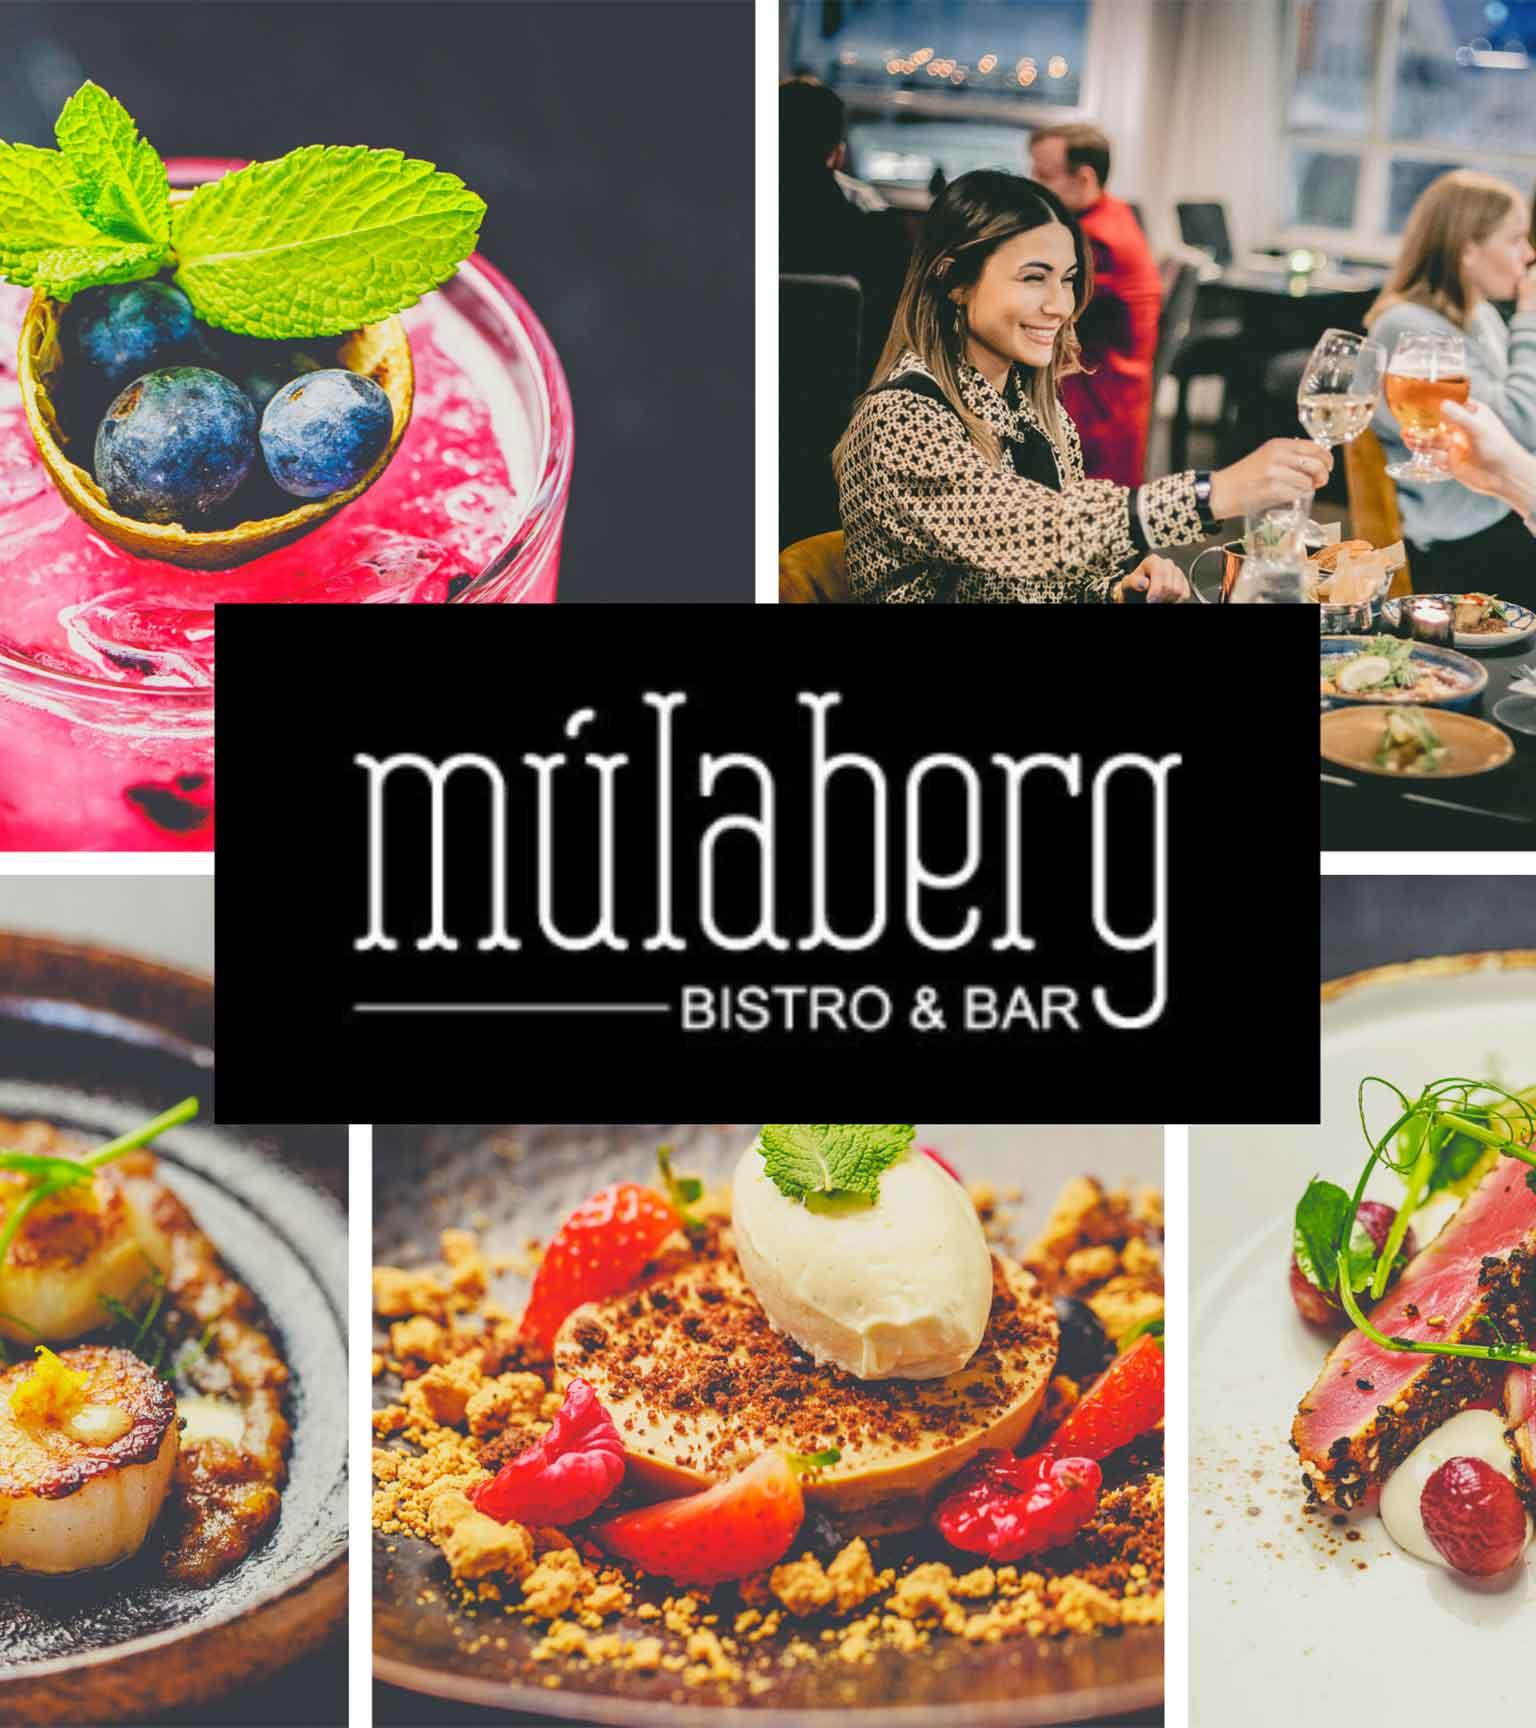 Múlaberg Bistro & Bar